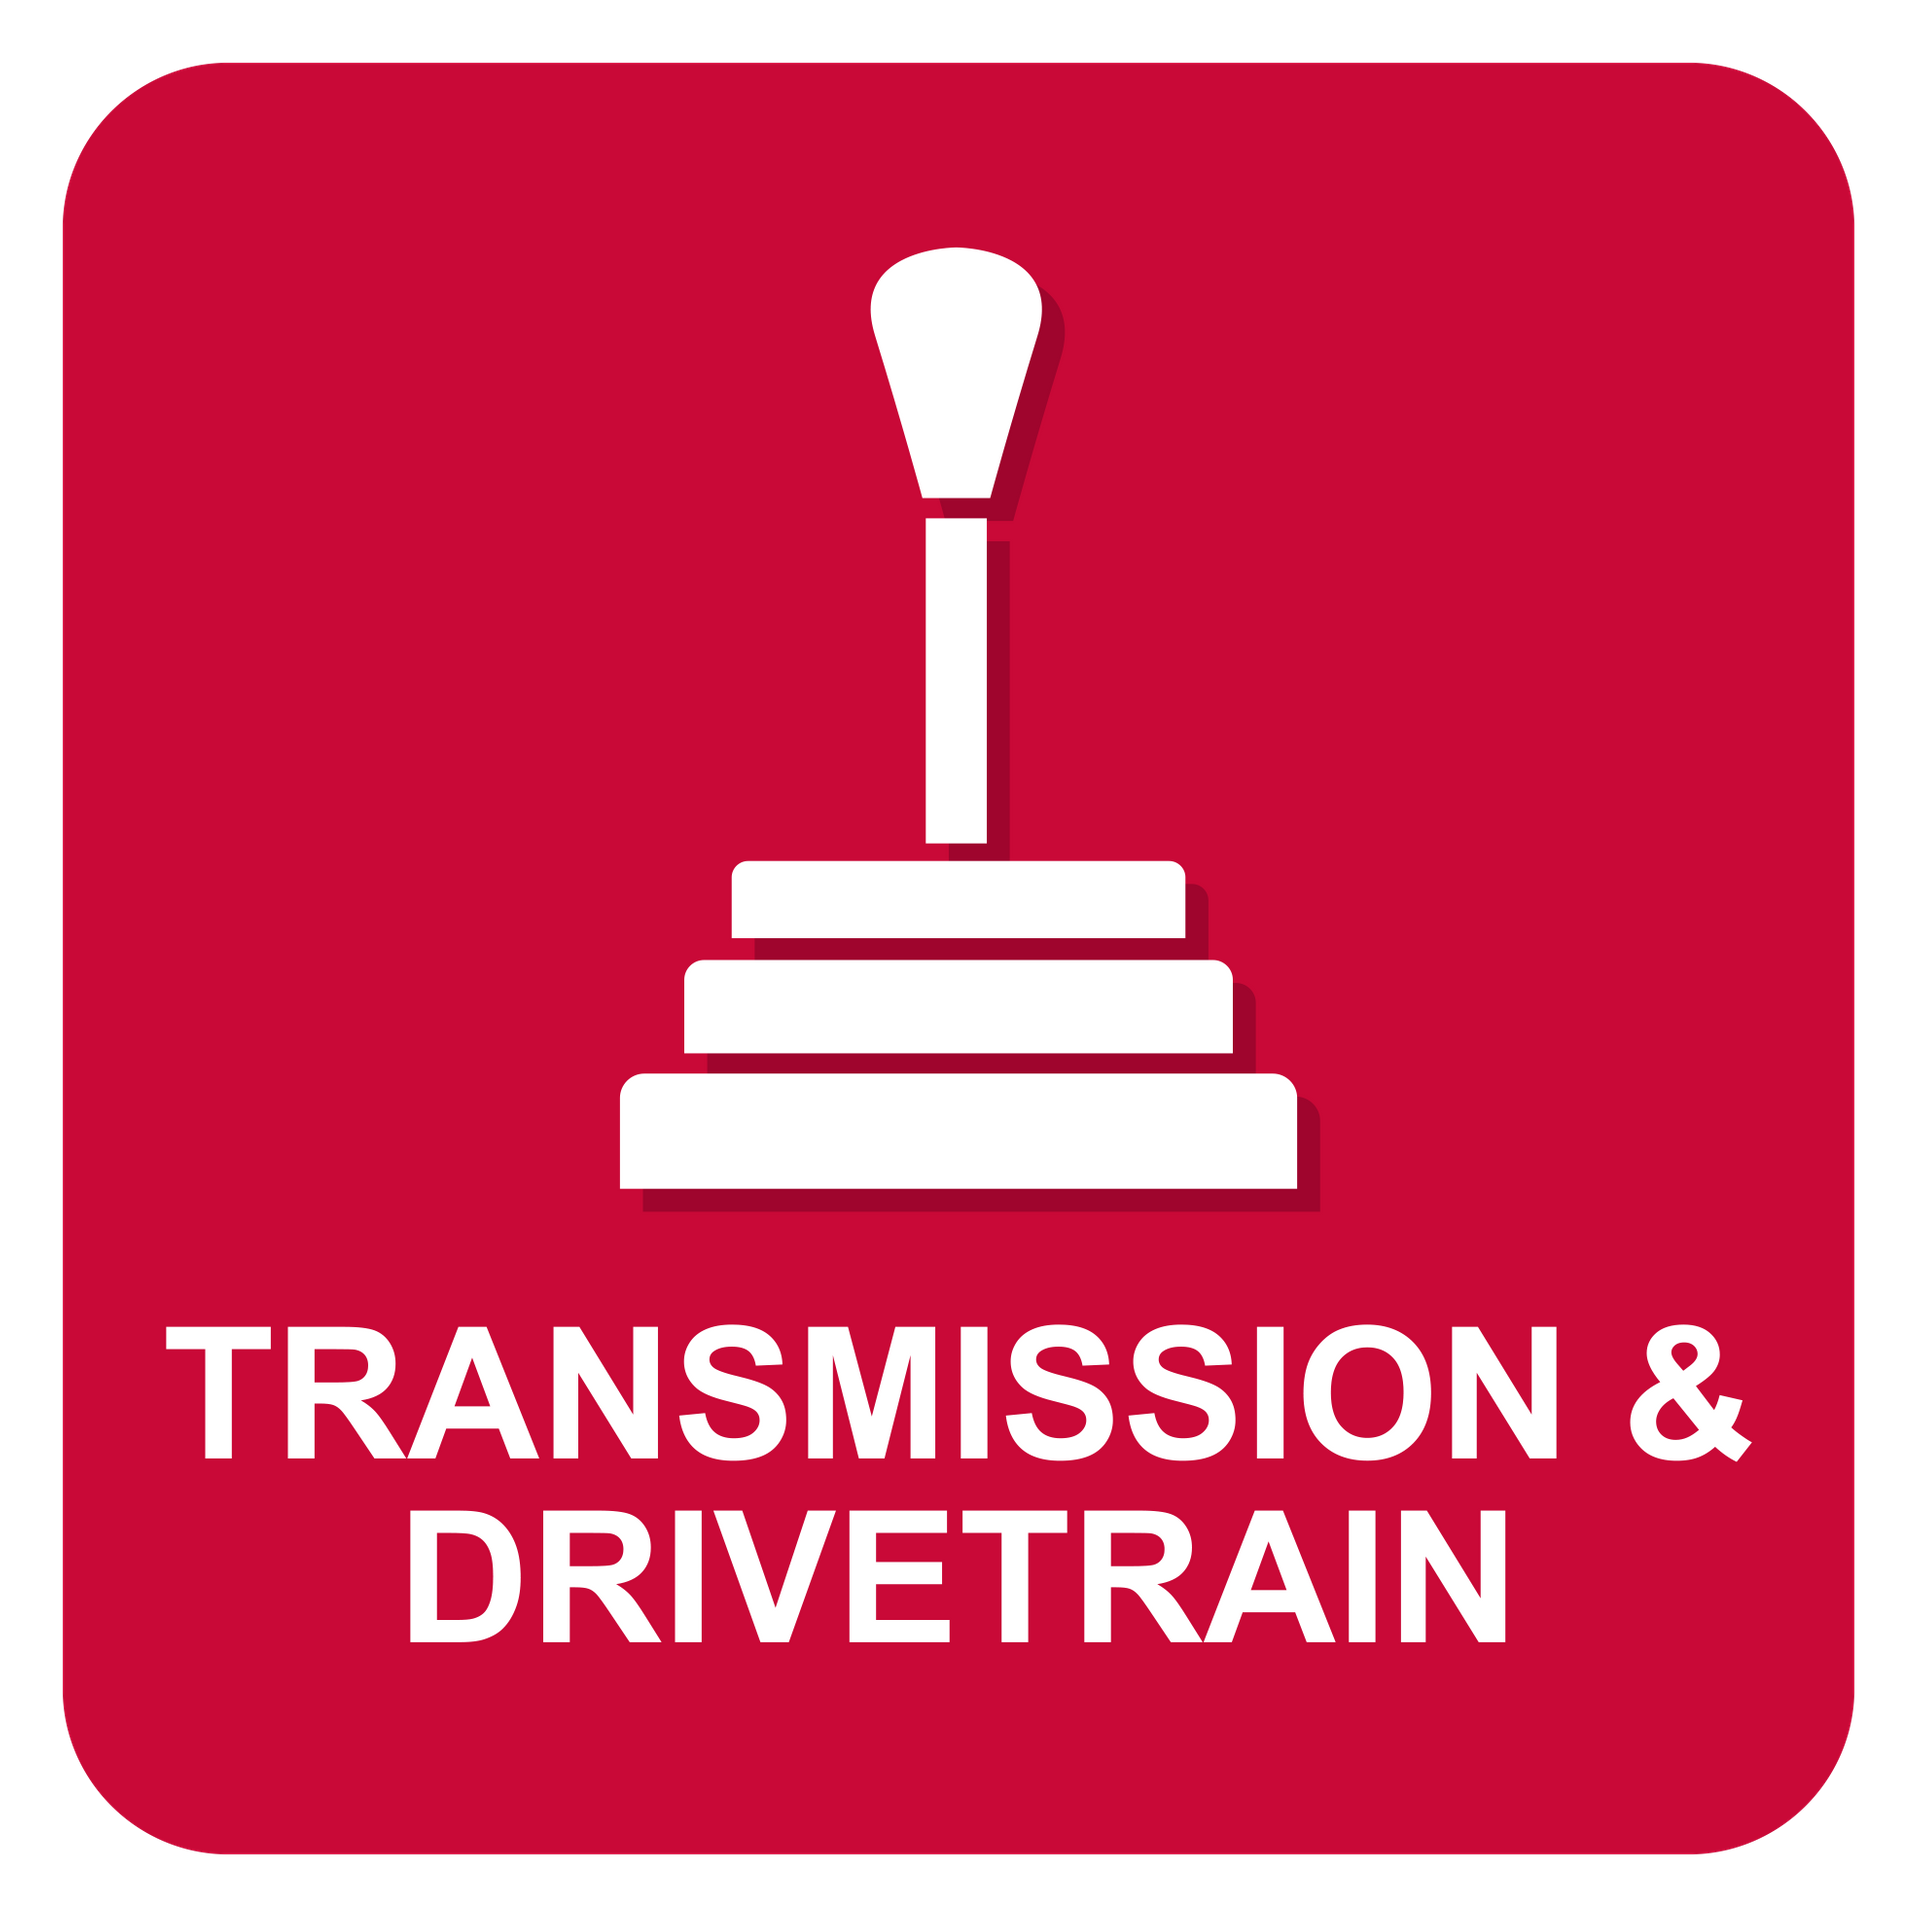 TRANSMISSION & DRIVETRAIN